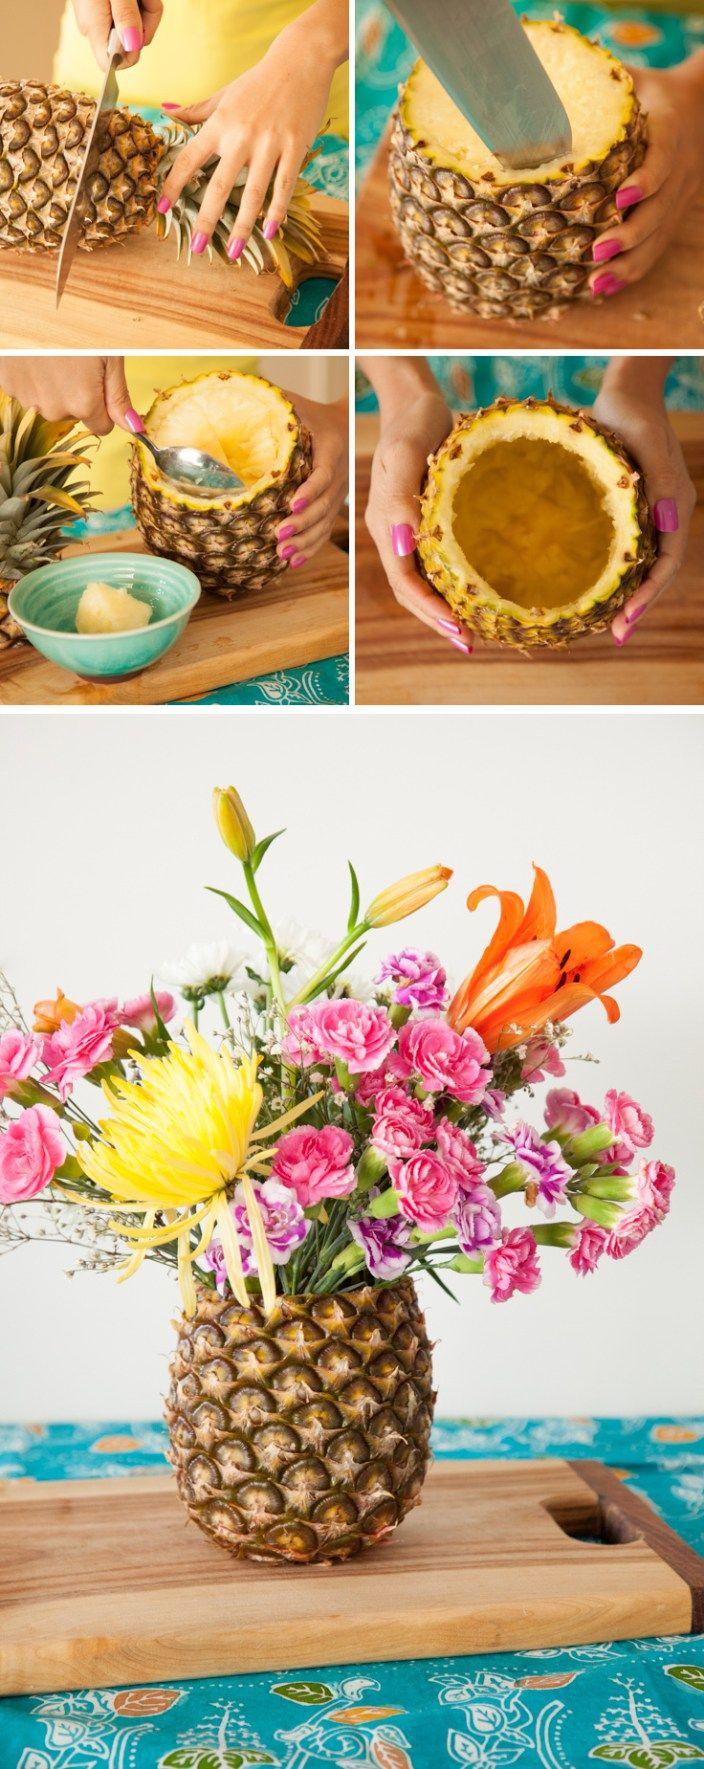 DIY Pineapple Vase - amazing floral centrepiece for summer!